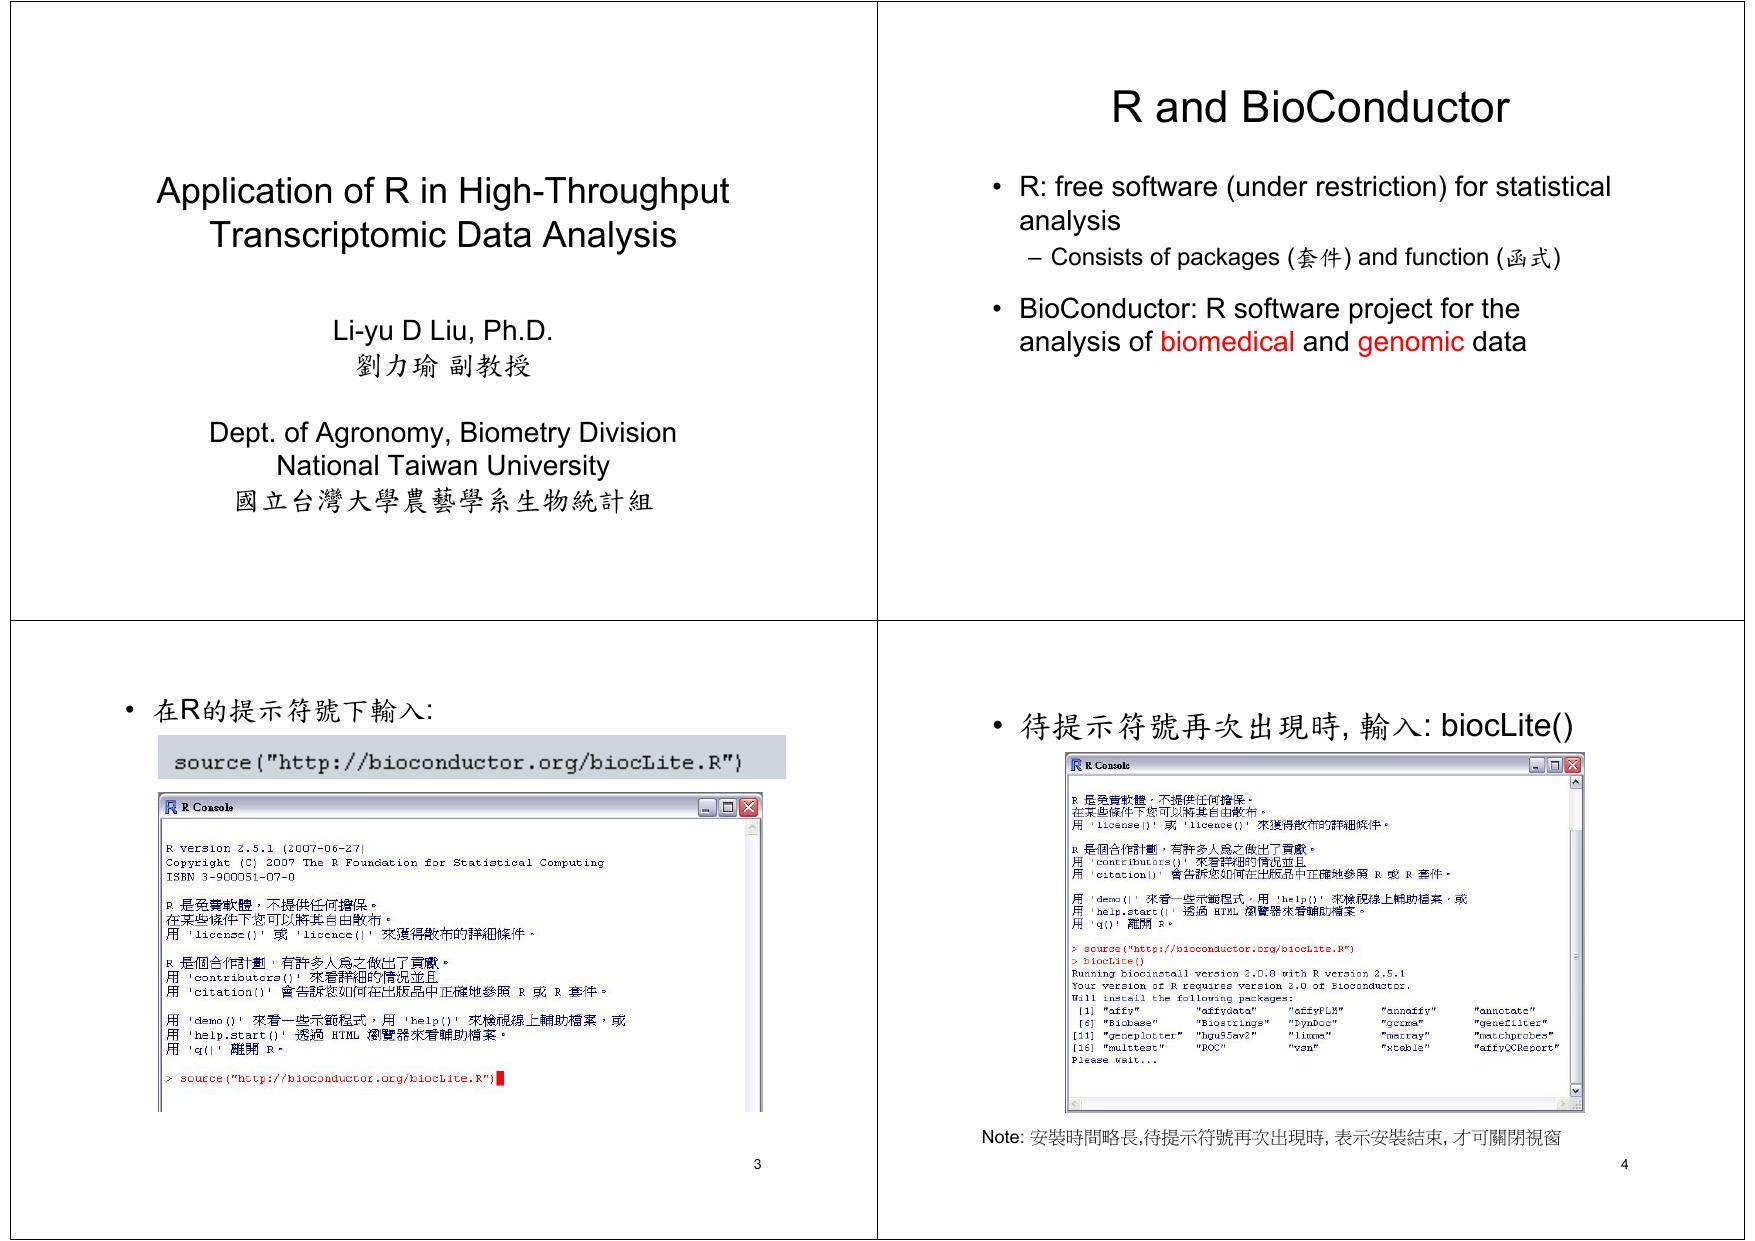 R and BioConductor